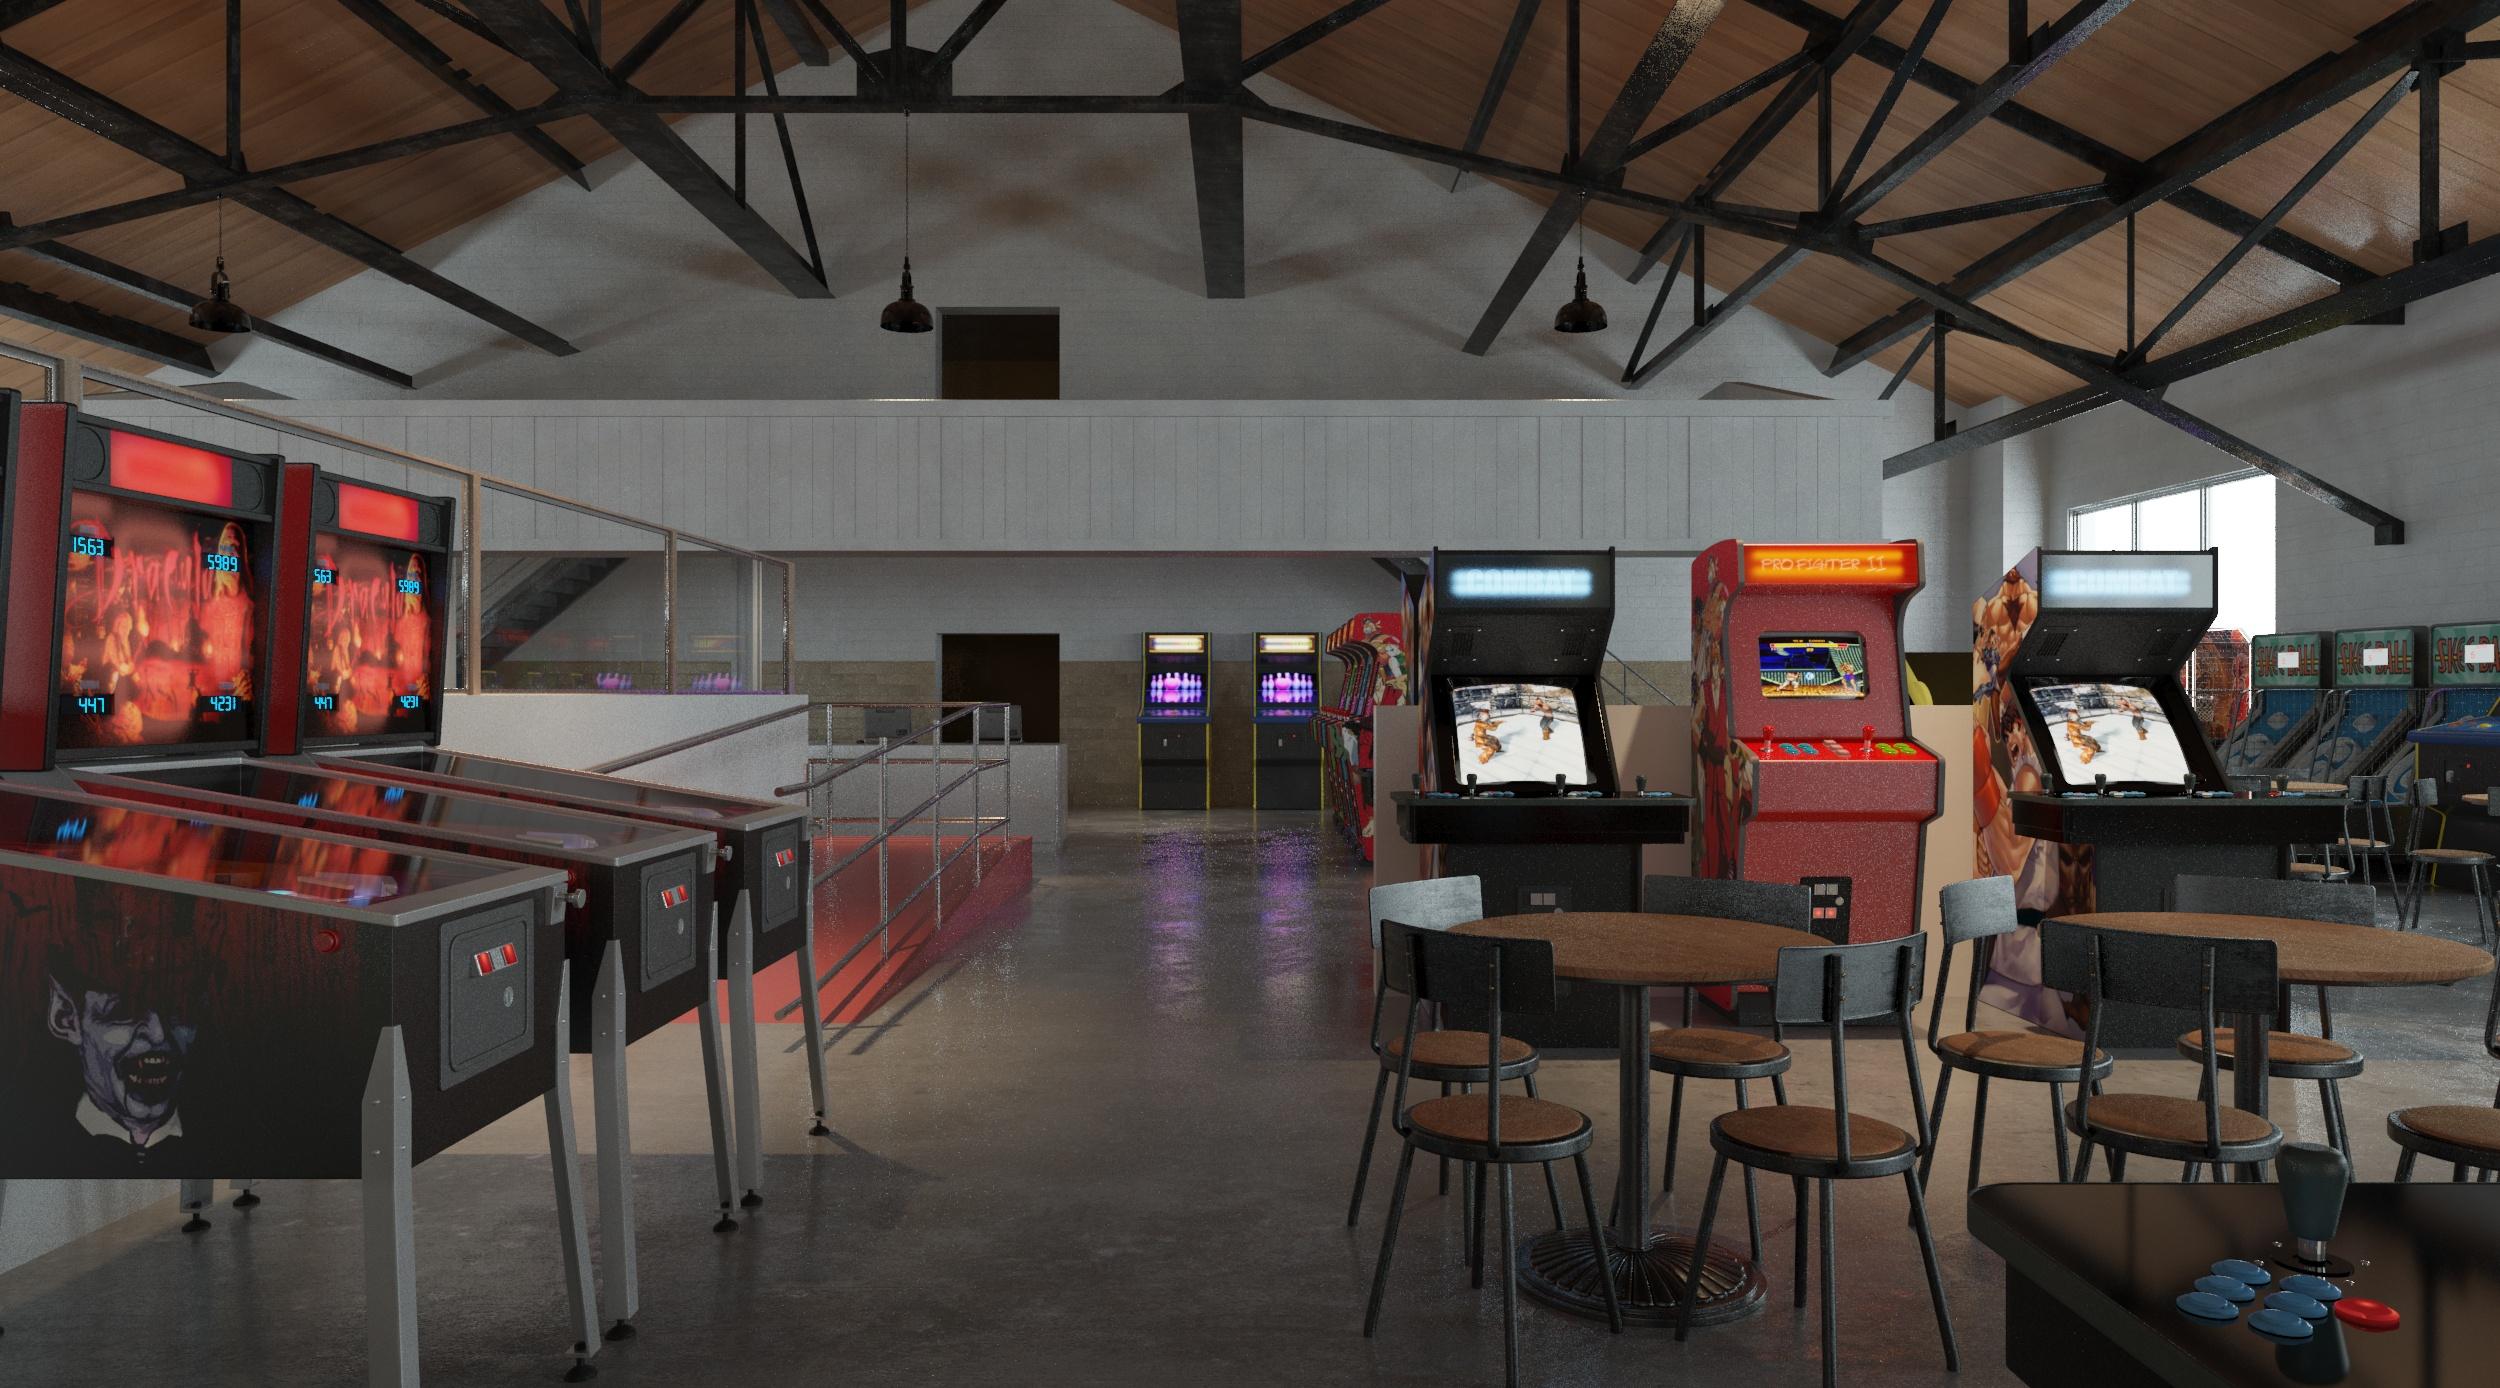 Entertainment Business Architecture and Interior Design